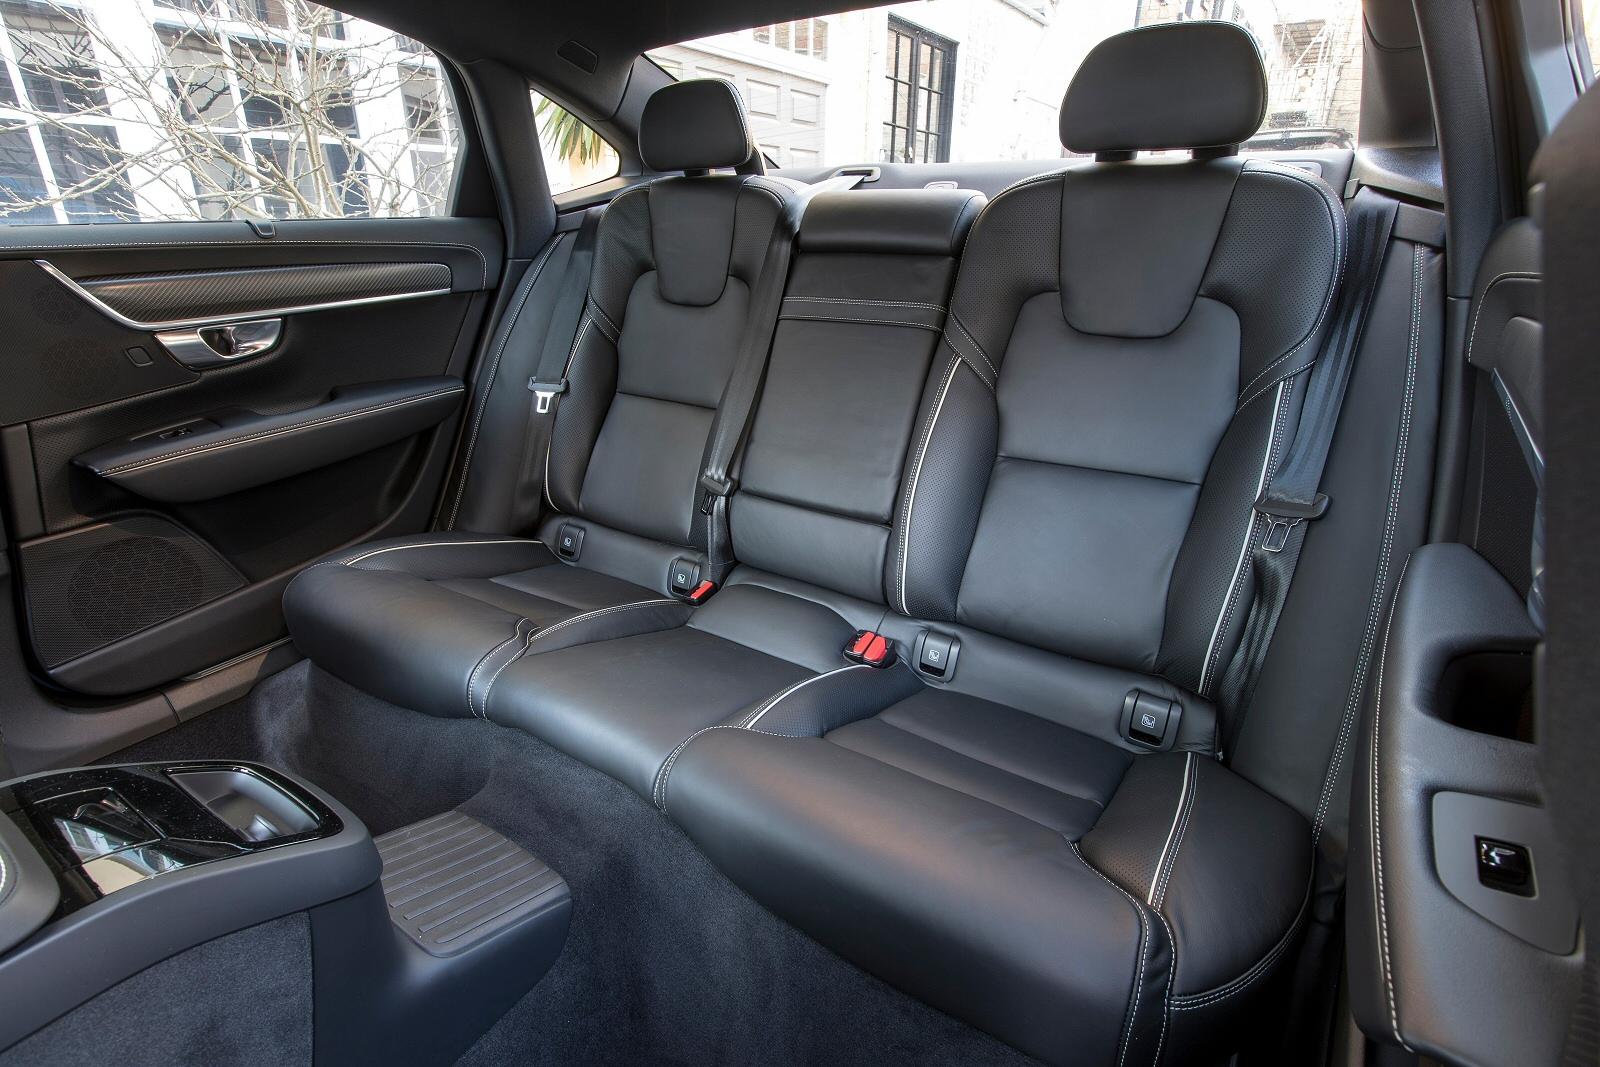 VolvoS901018Int(4)